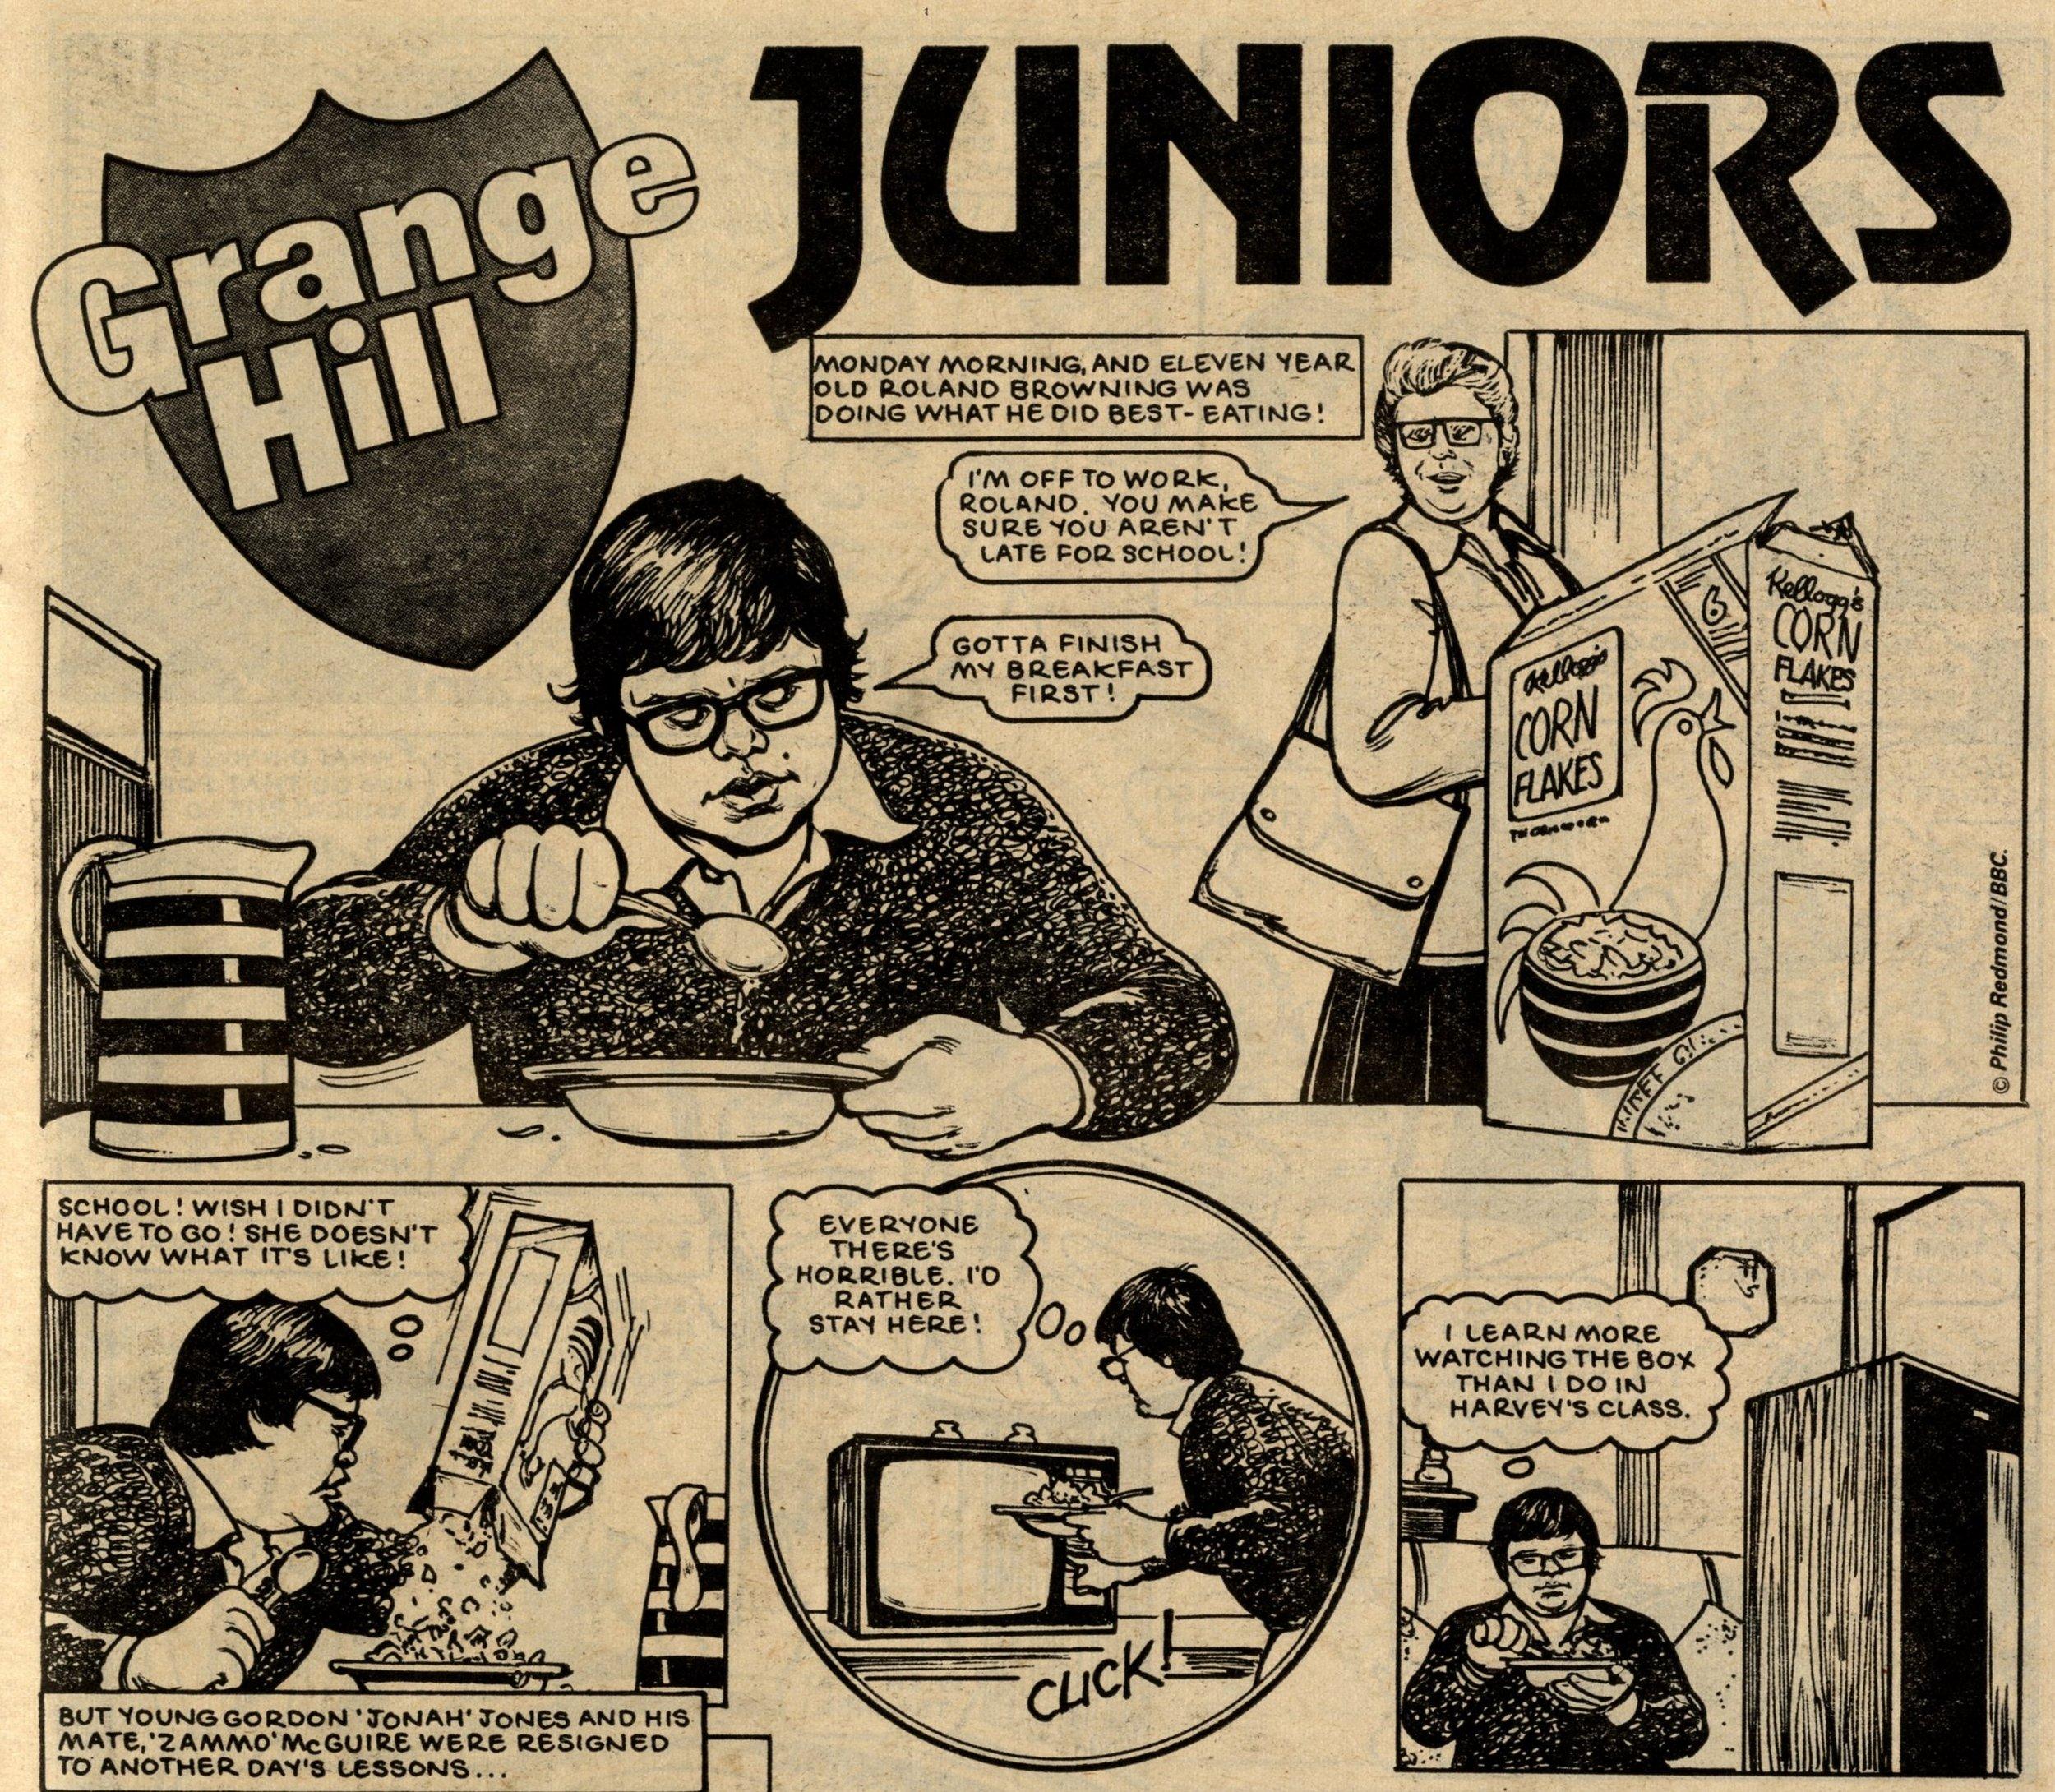 Grange Hill Juniors: Brian Delaney (artist)